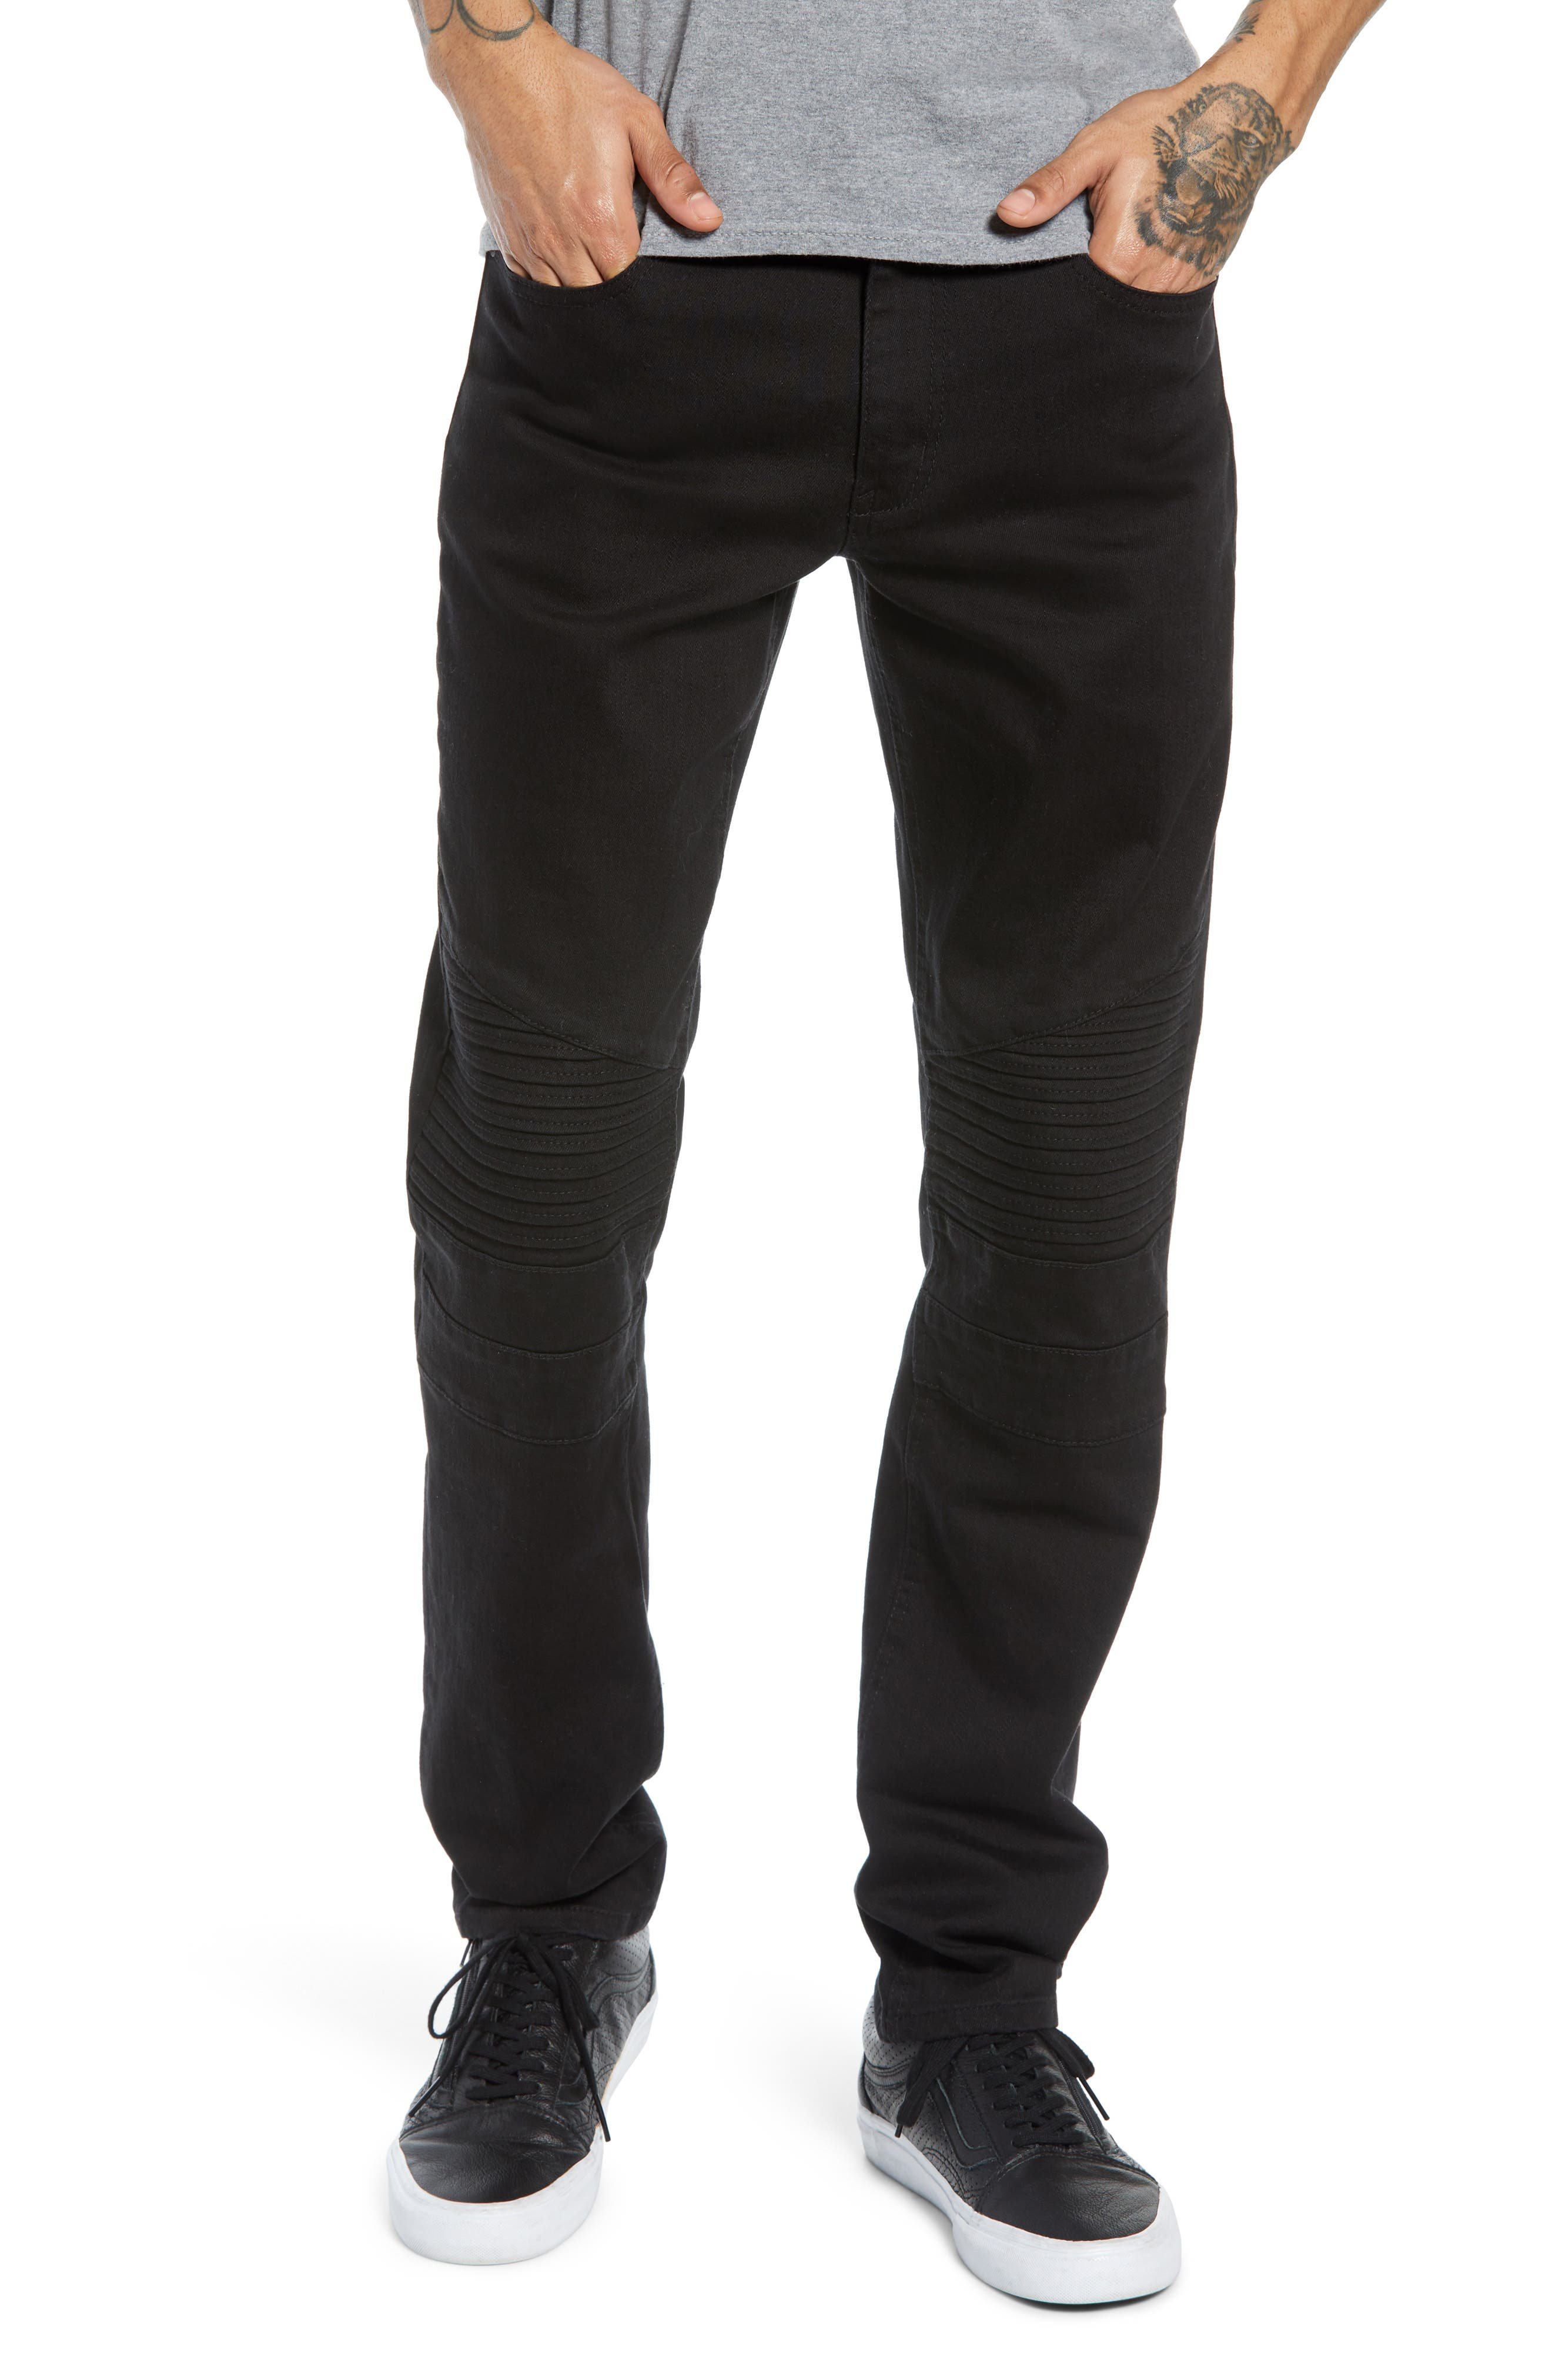 THE RAIL Skinny Moto Jeans, Main, color, BLACK WASH